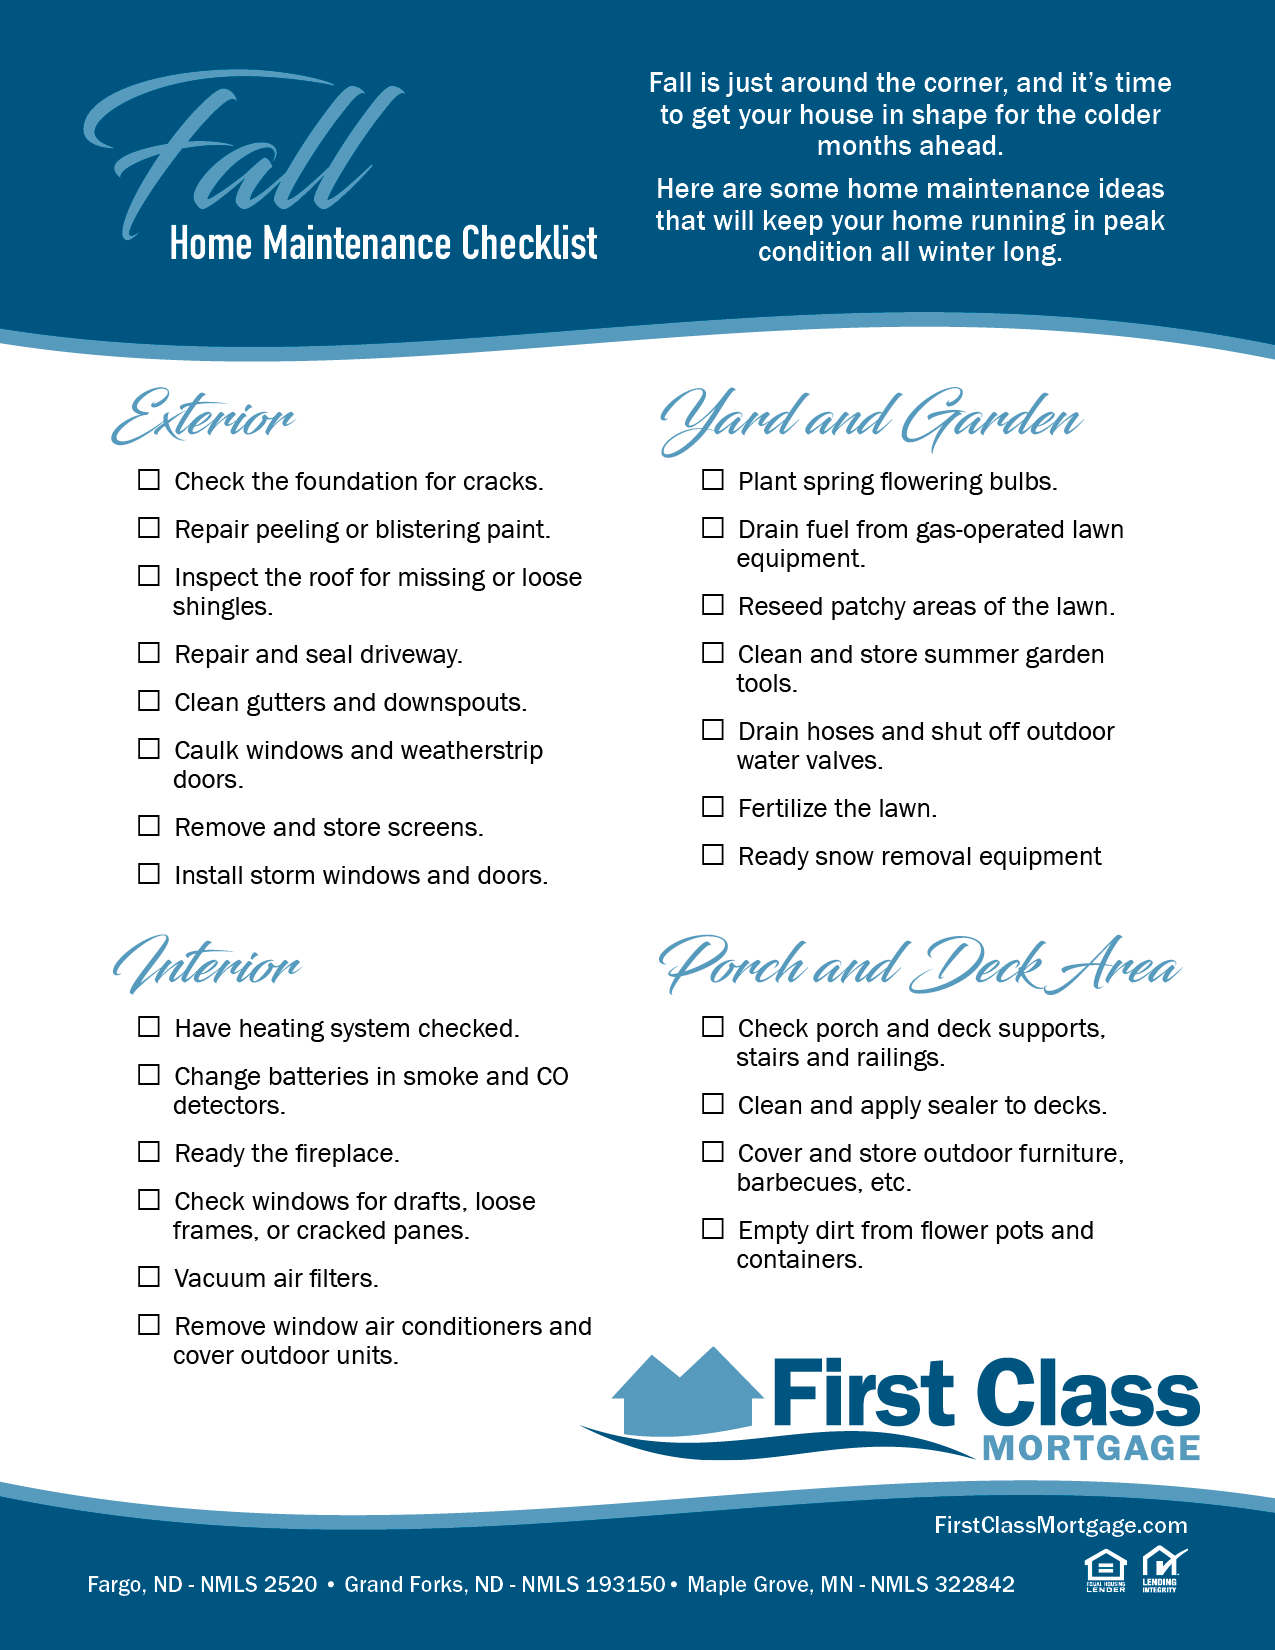 Fall checklist_FCM